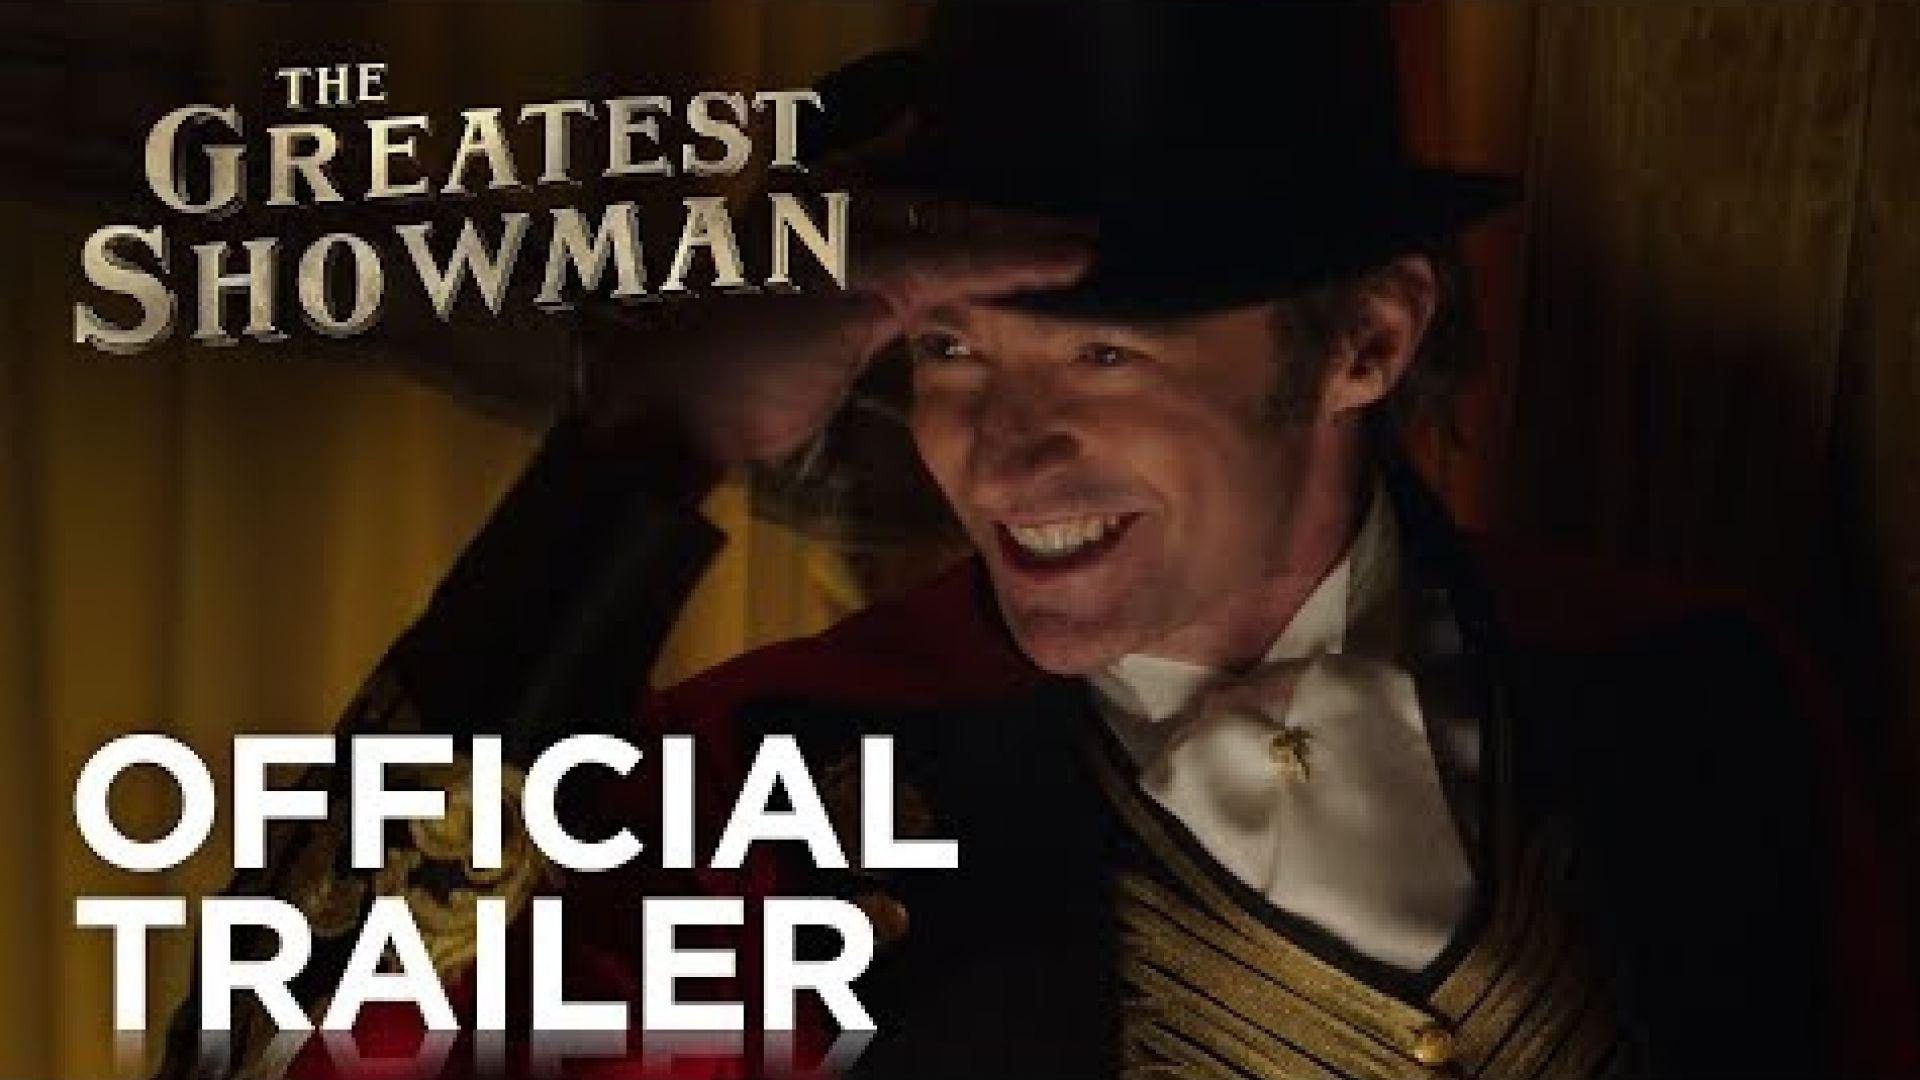 The Greatest Showman Trailer 20th Century Fox